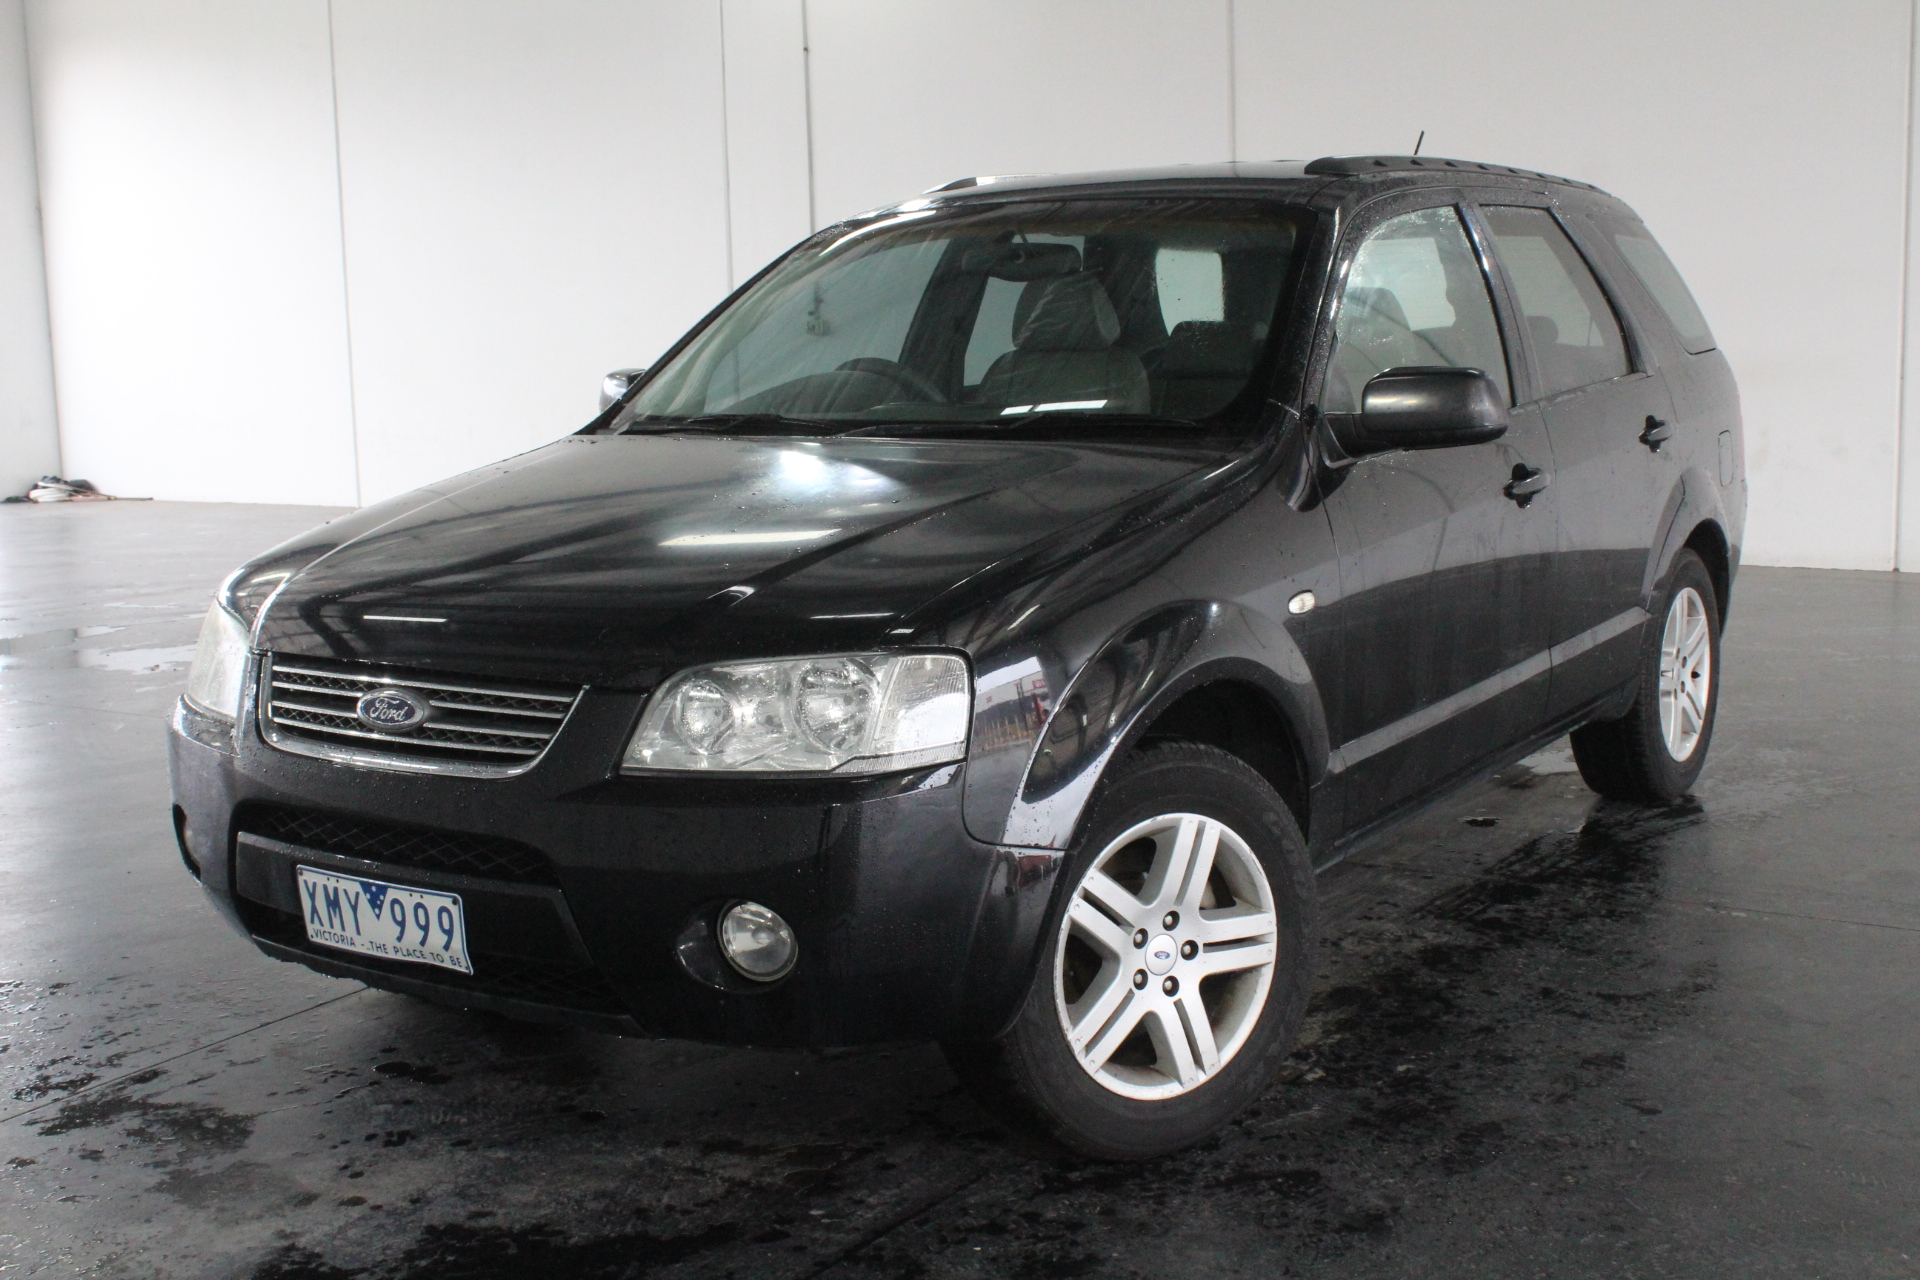 2005 Ford Territory Ghia (RWD) SX Automatic Wagon